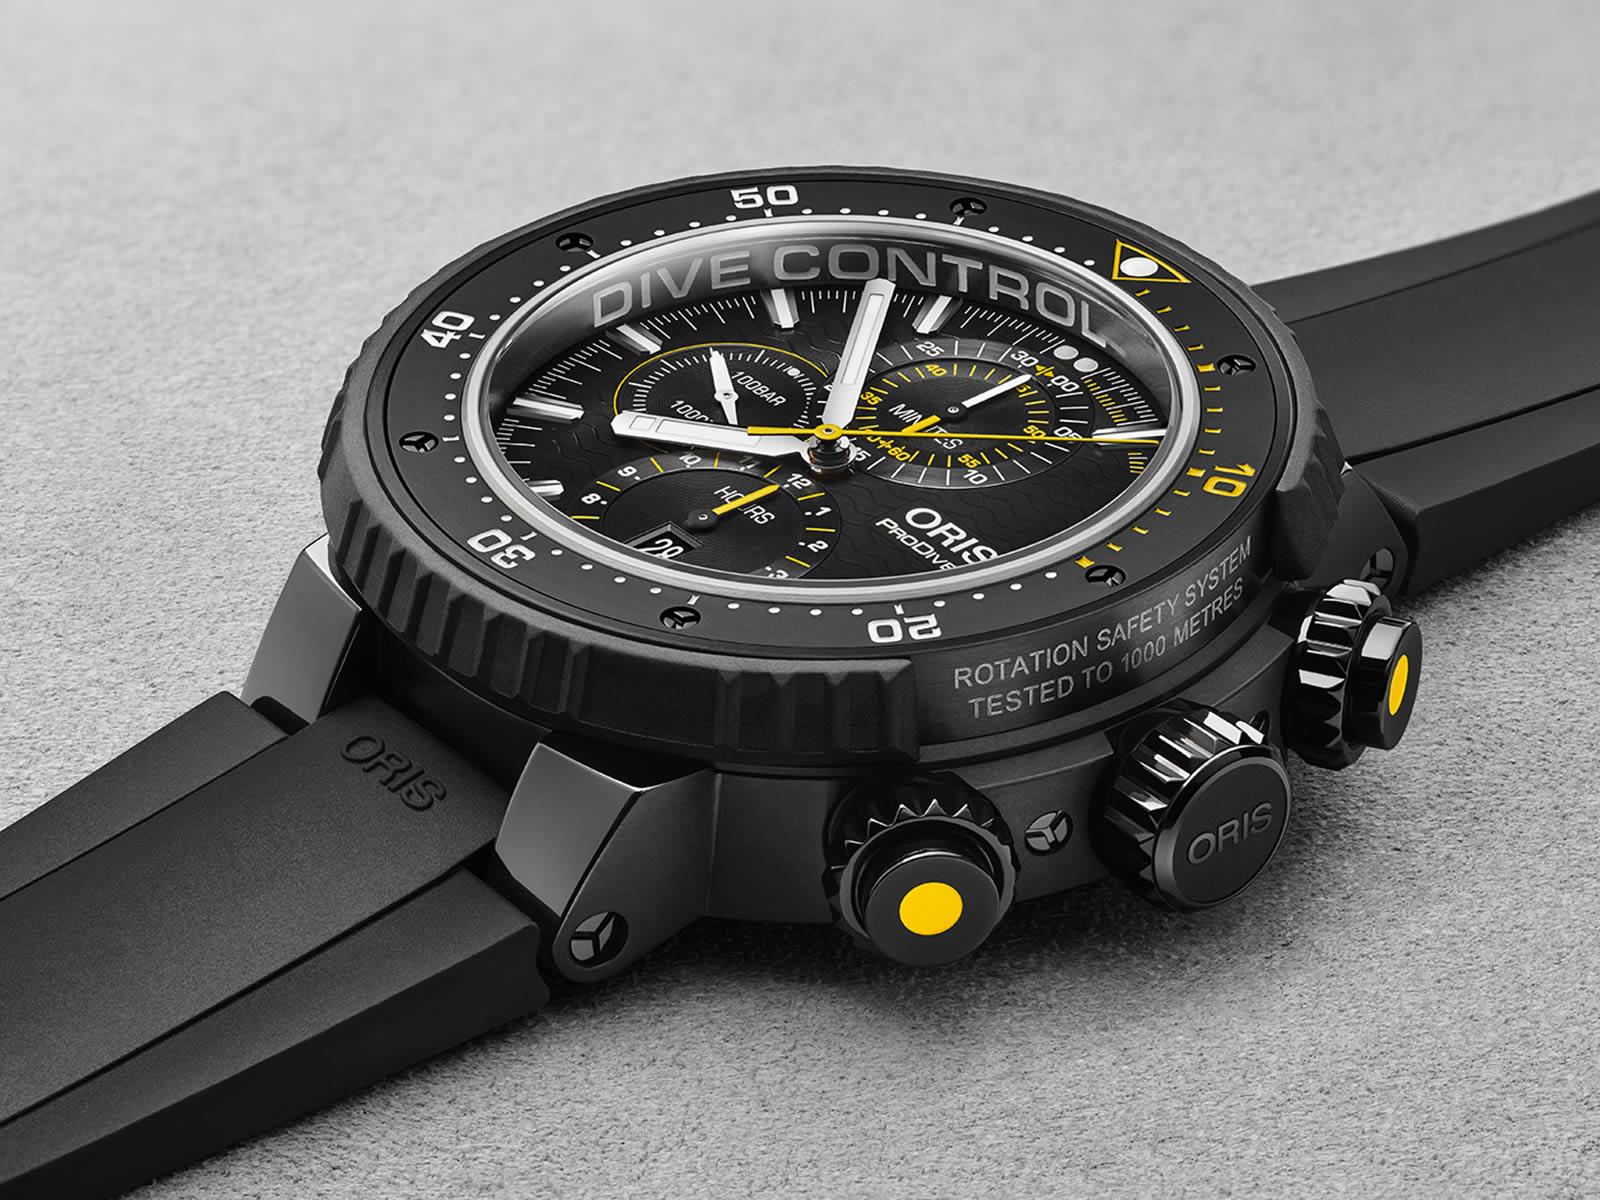 01-774-7727-7784-set-oris-prodiver-dive-control-chronograph-11-.jpg